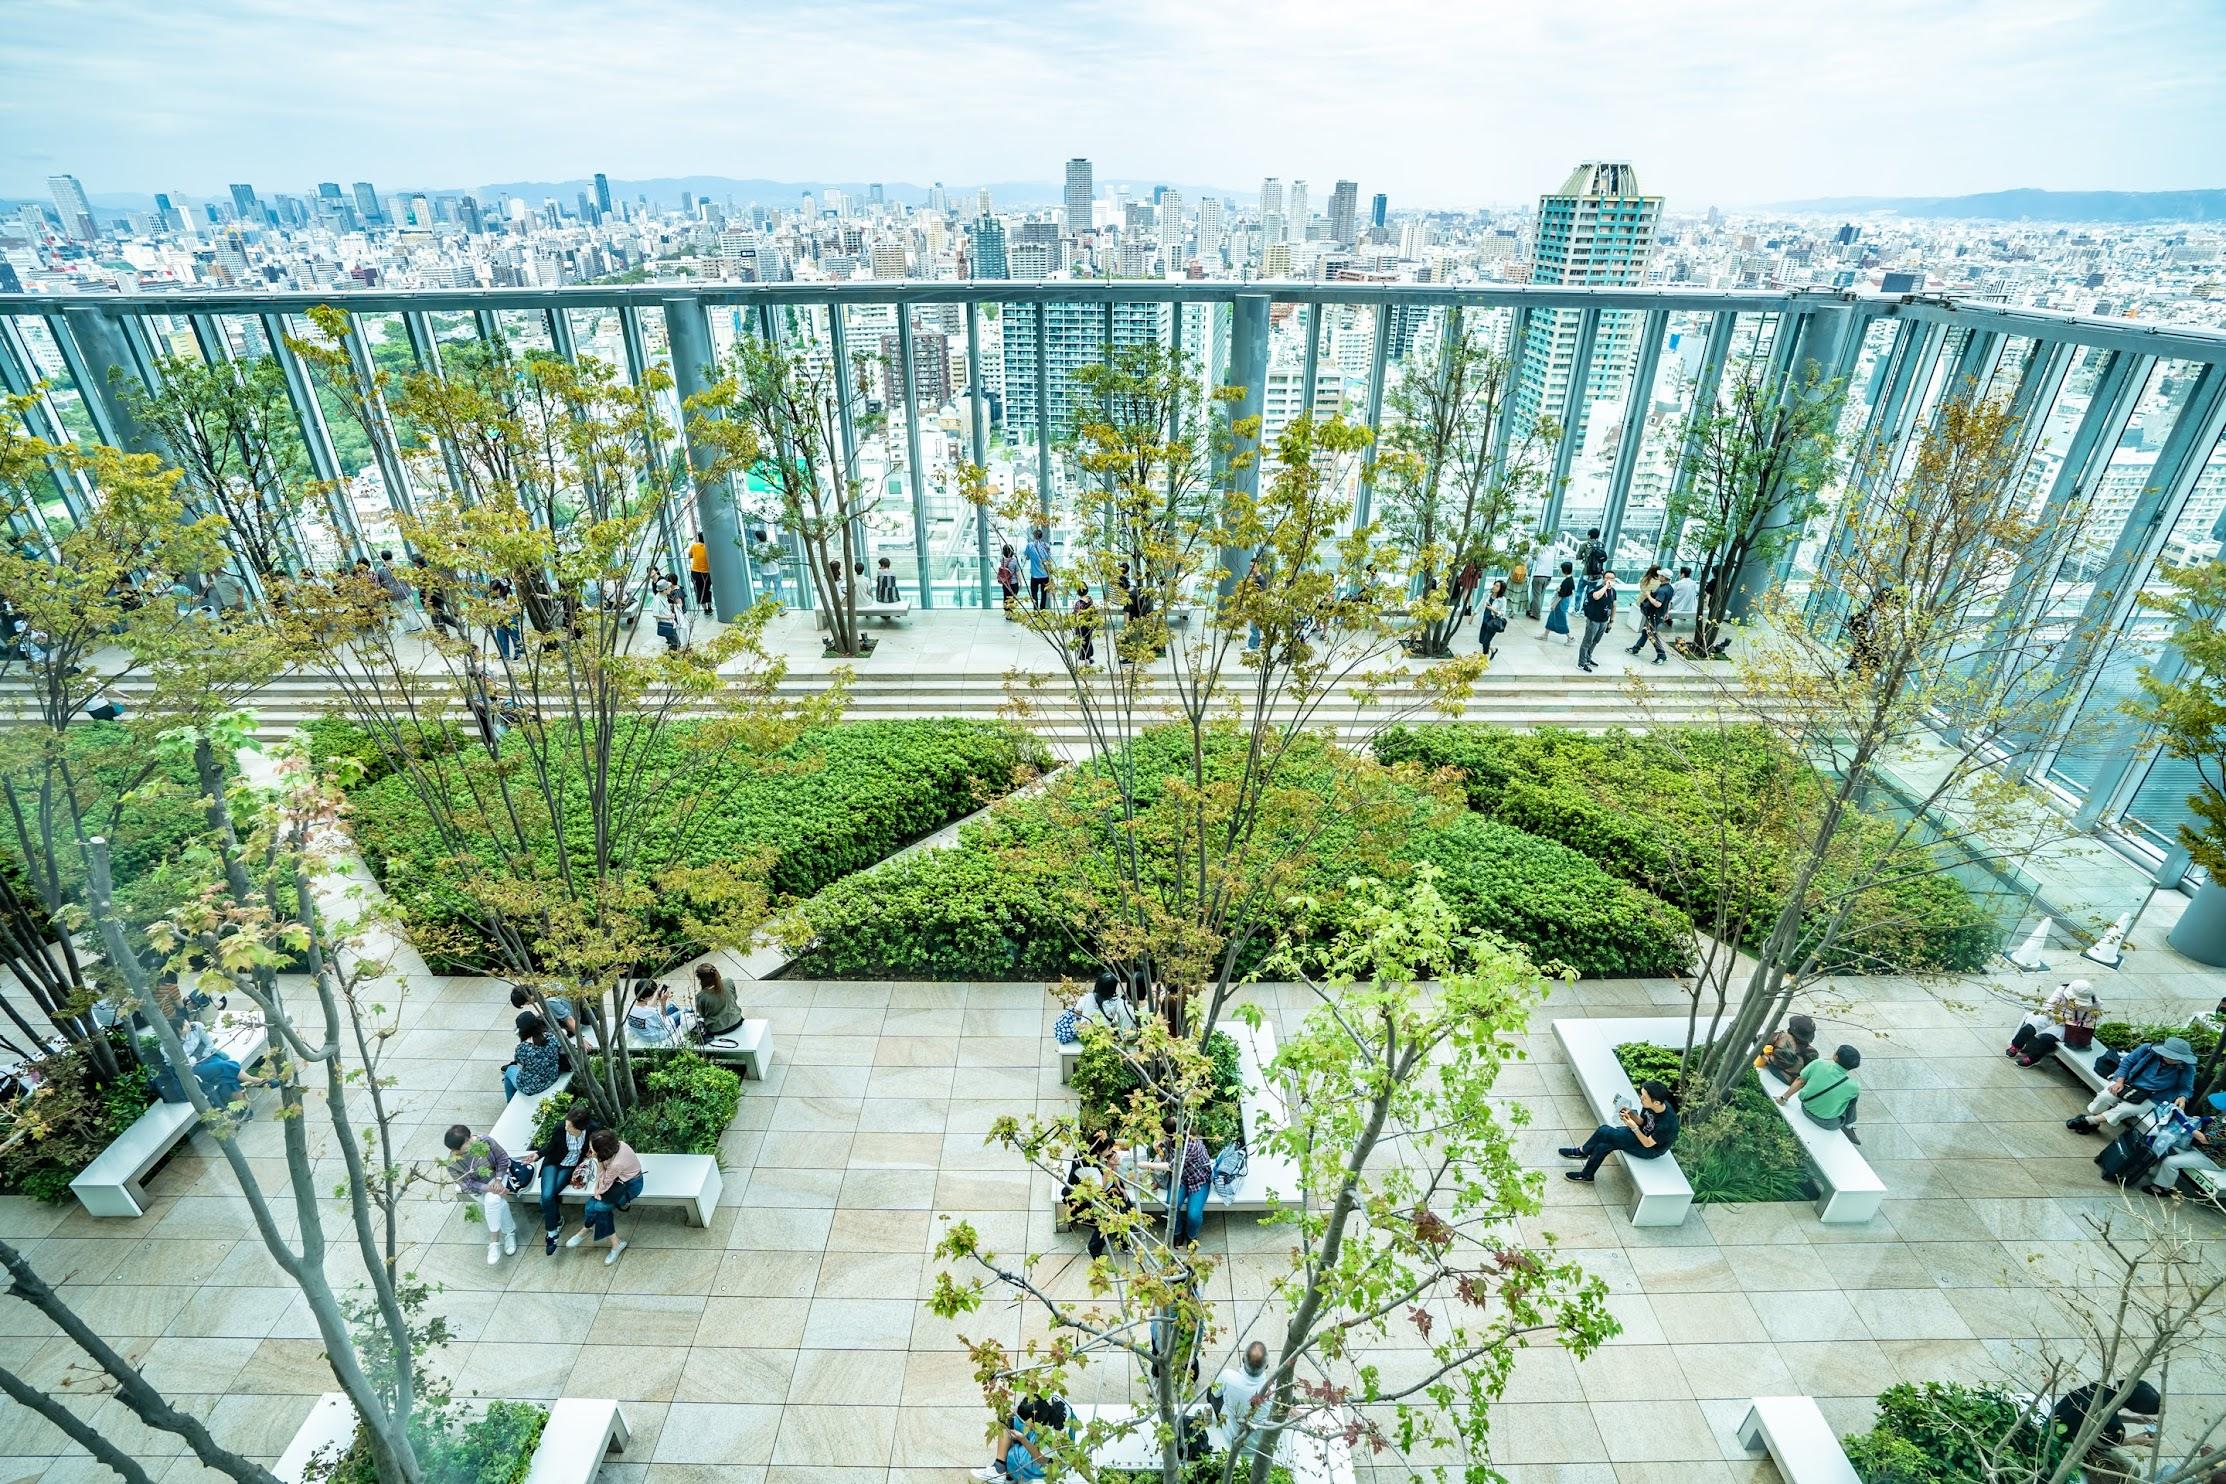 Abeno Harukas roof garden5